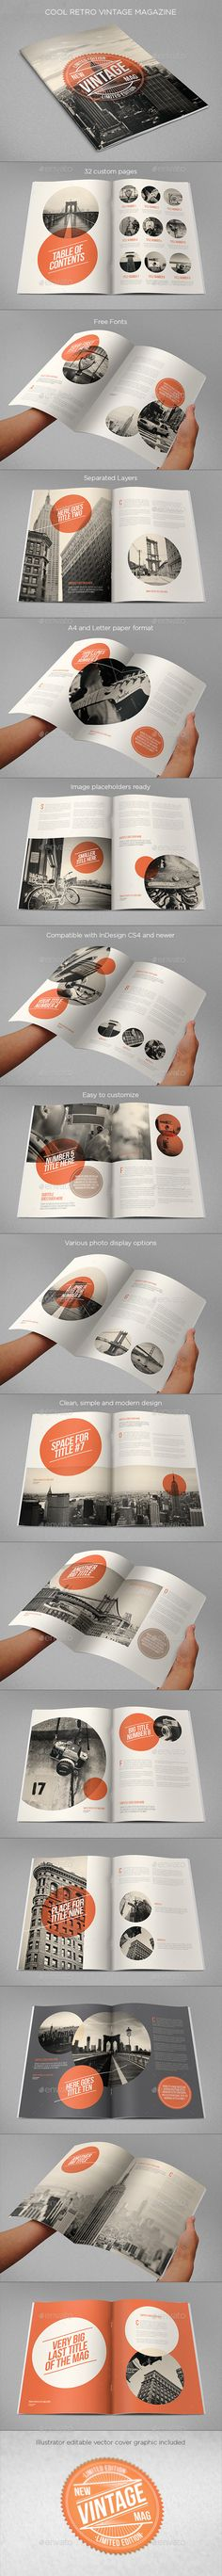 Cool Retro Vintage Magazine Template #design Download: http://graphicriver.net/item/cool-retro-vintage-magazine/11819609?ref=ksioks